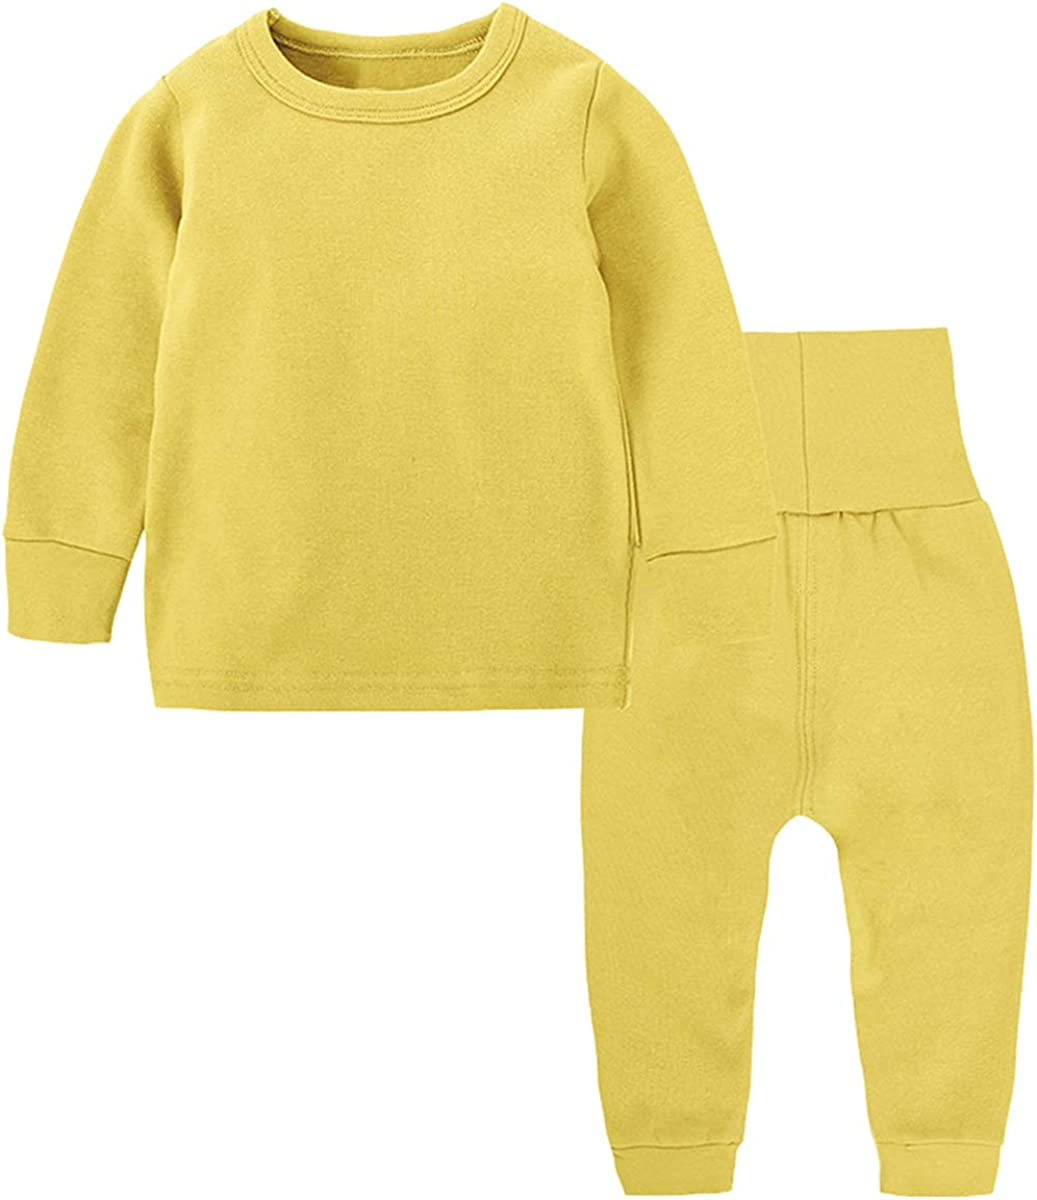 Toddler Boy's Thermal Underwear Set Base Layer Top & Bottom Set, Yellow, 4-5T = Tag 130